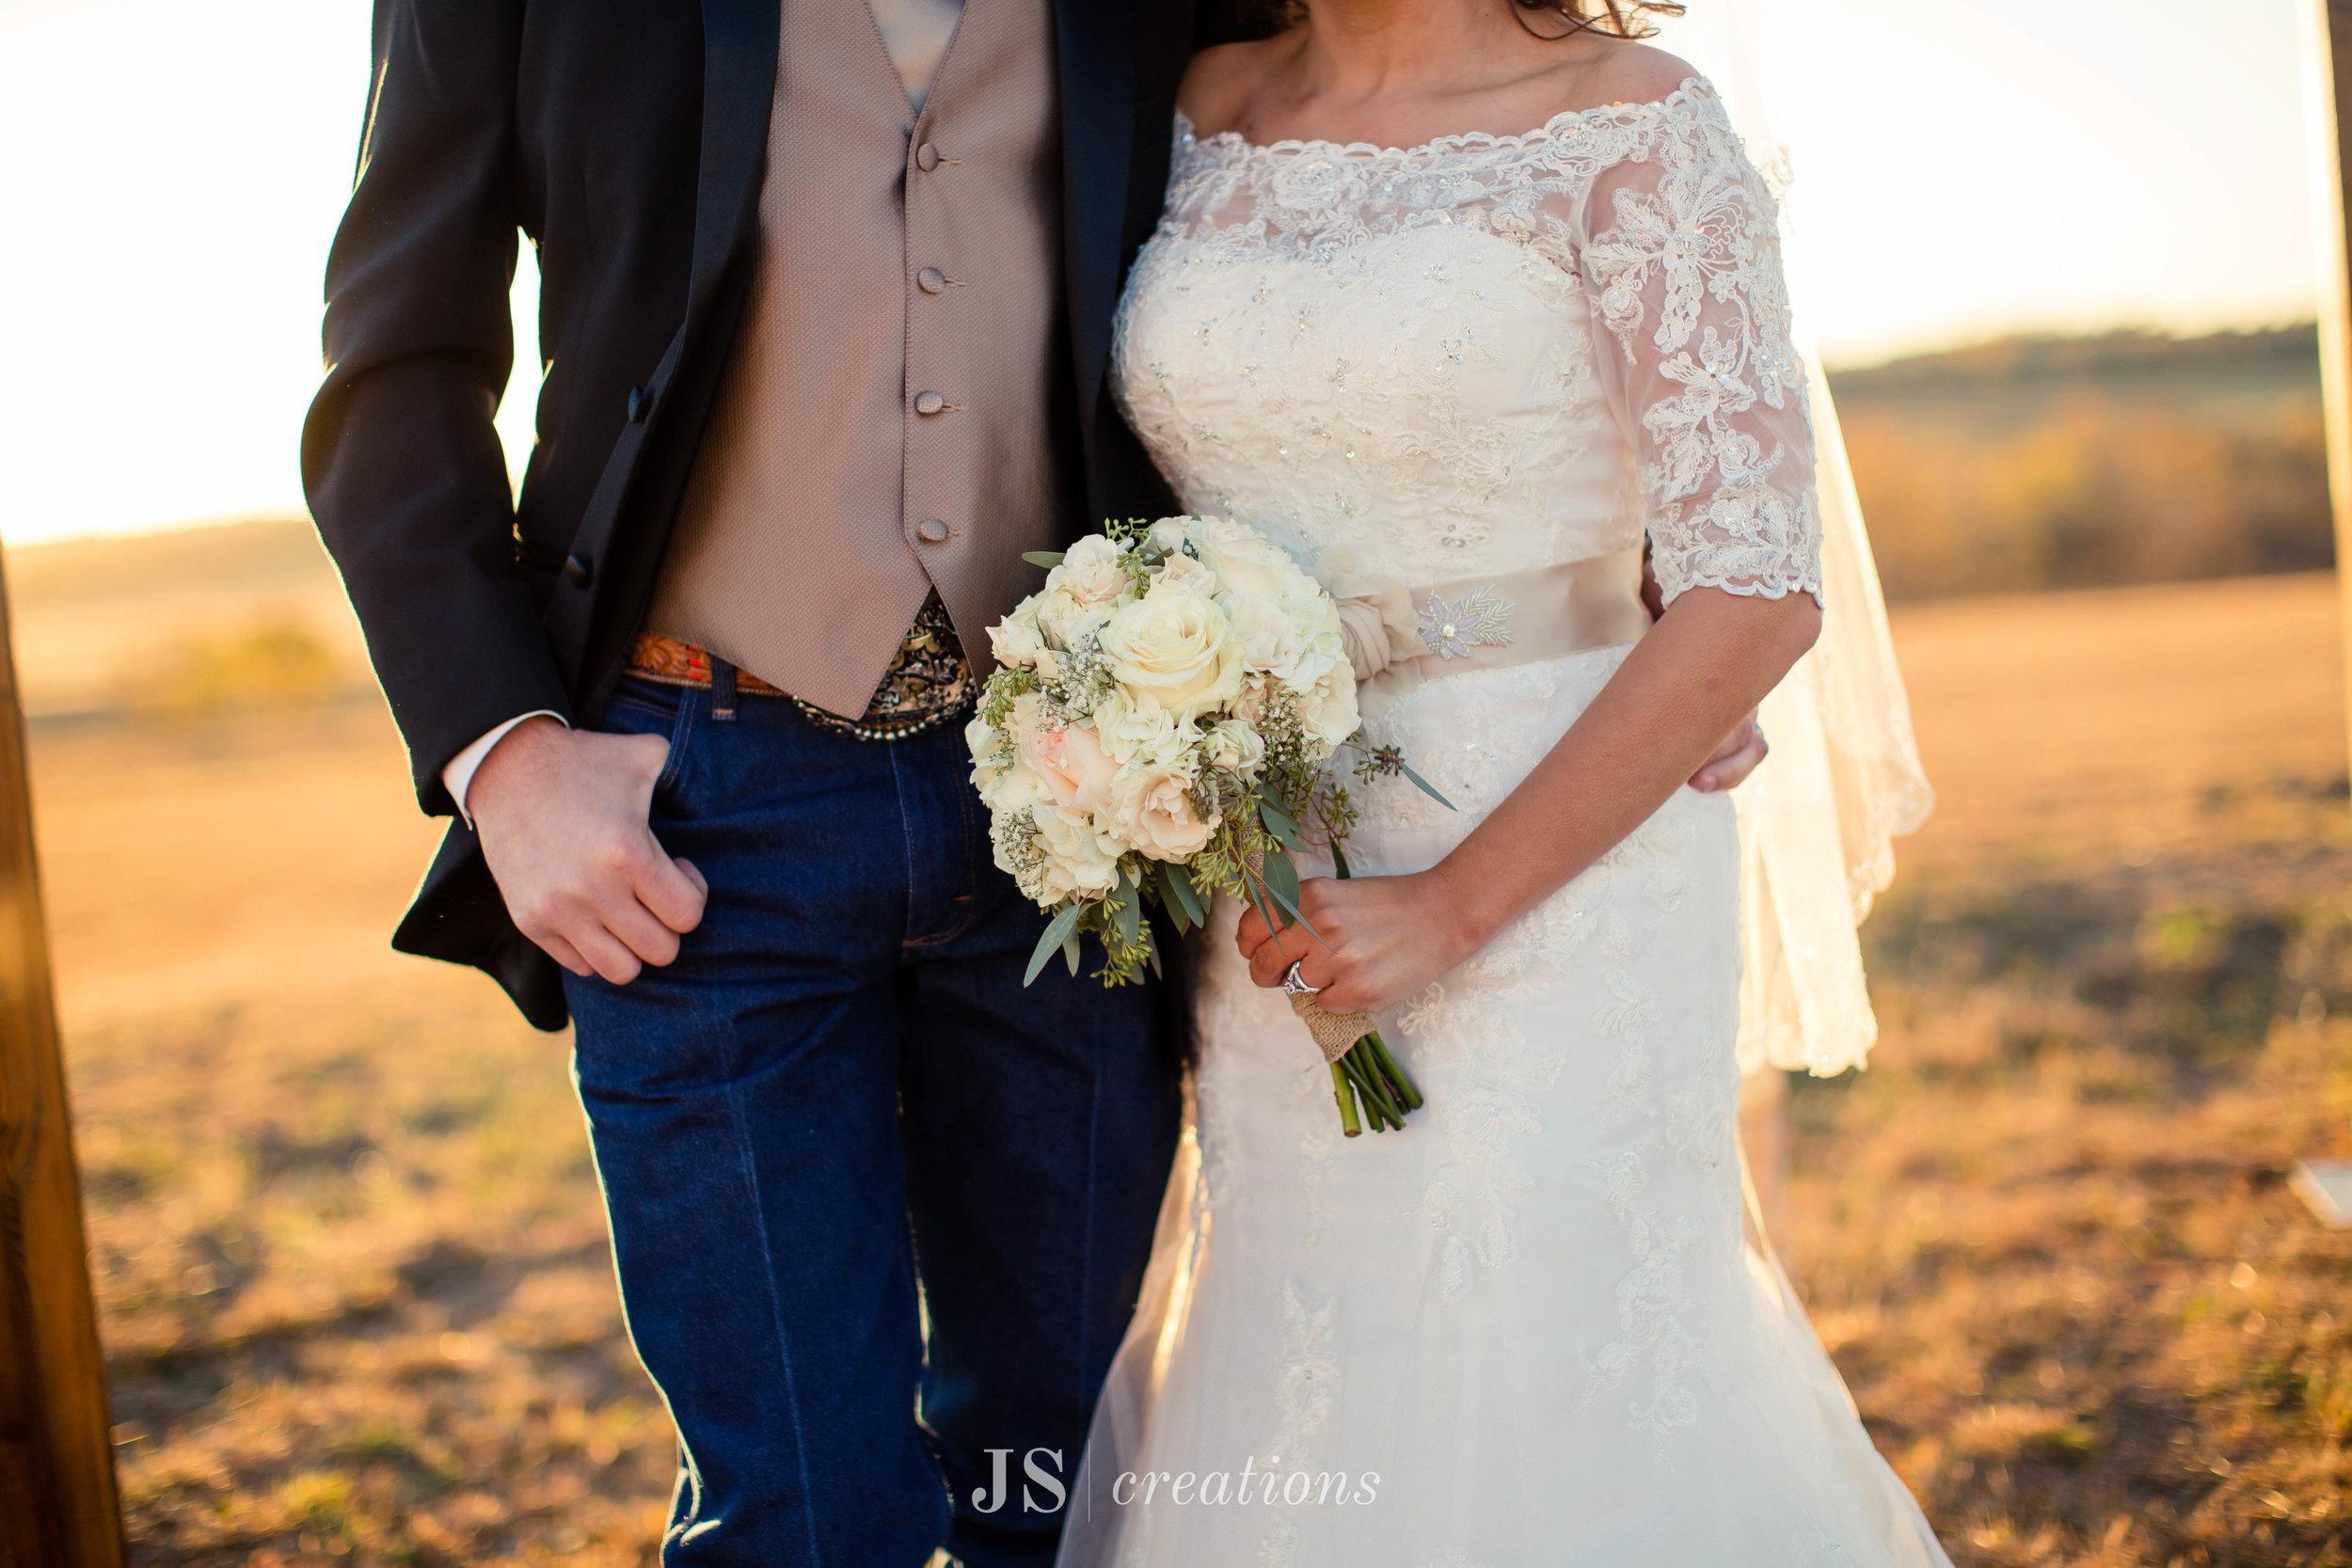 JSCreations_Weddings-9384.jpg